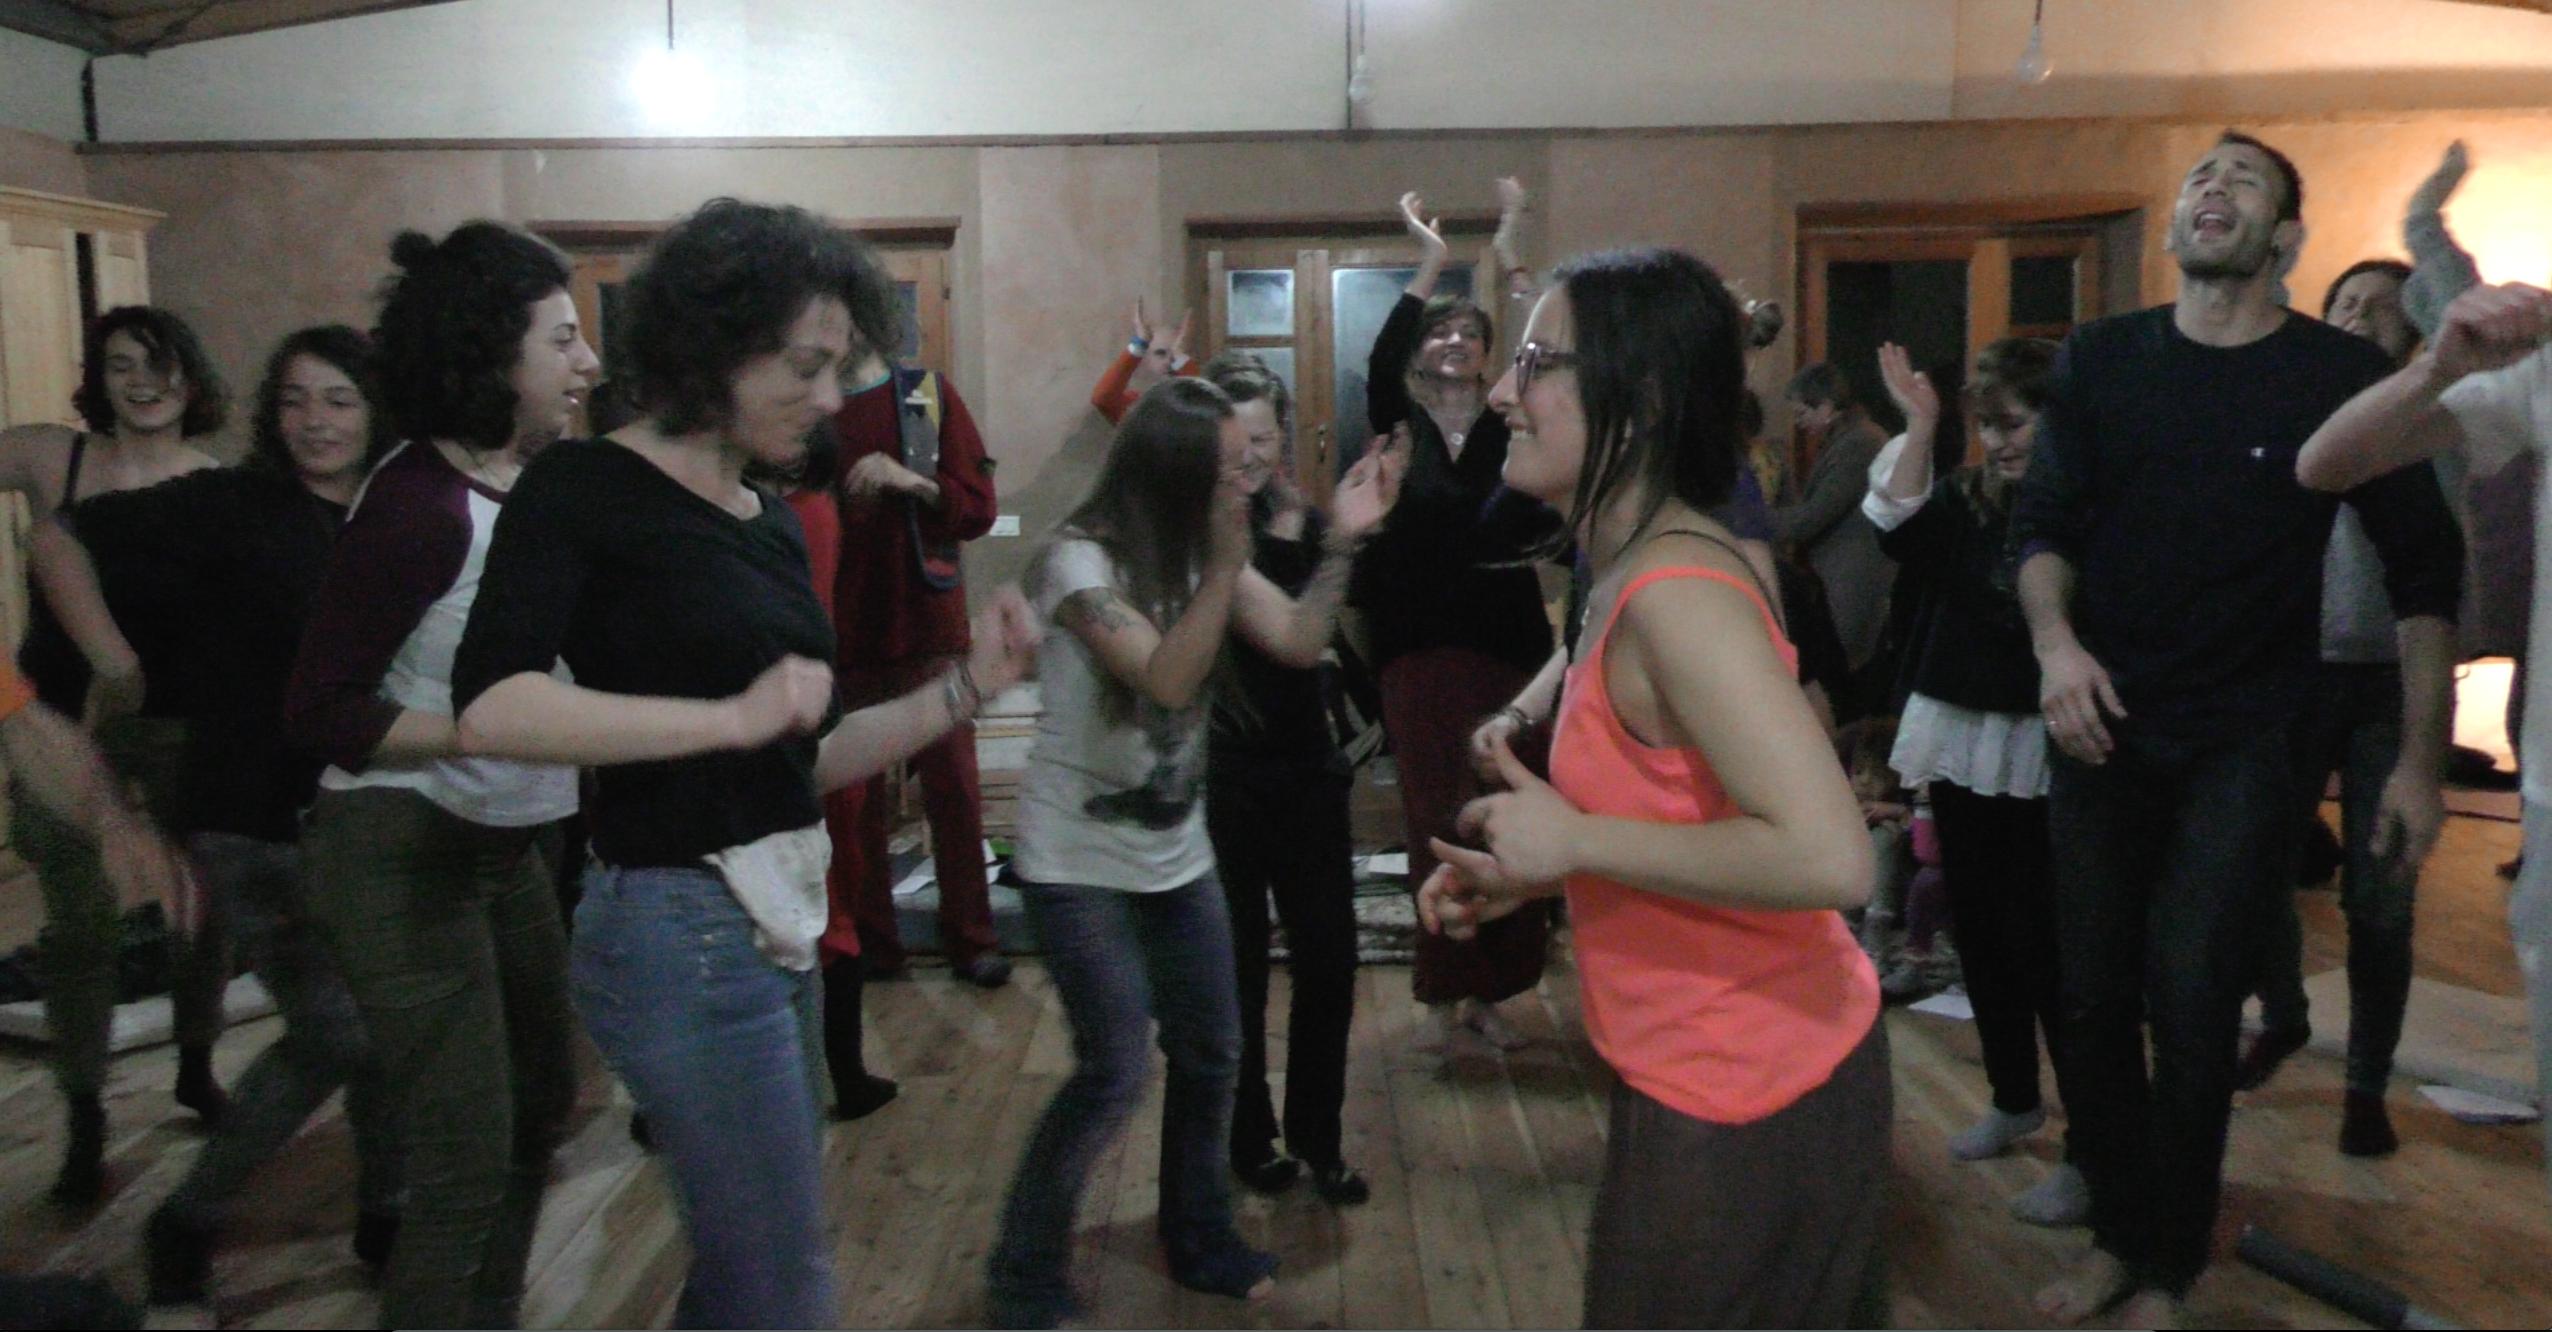 Un concerto improvvisato con balli